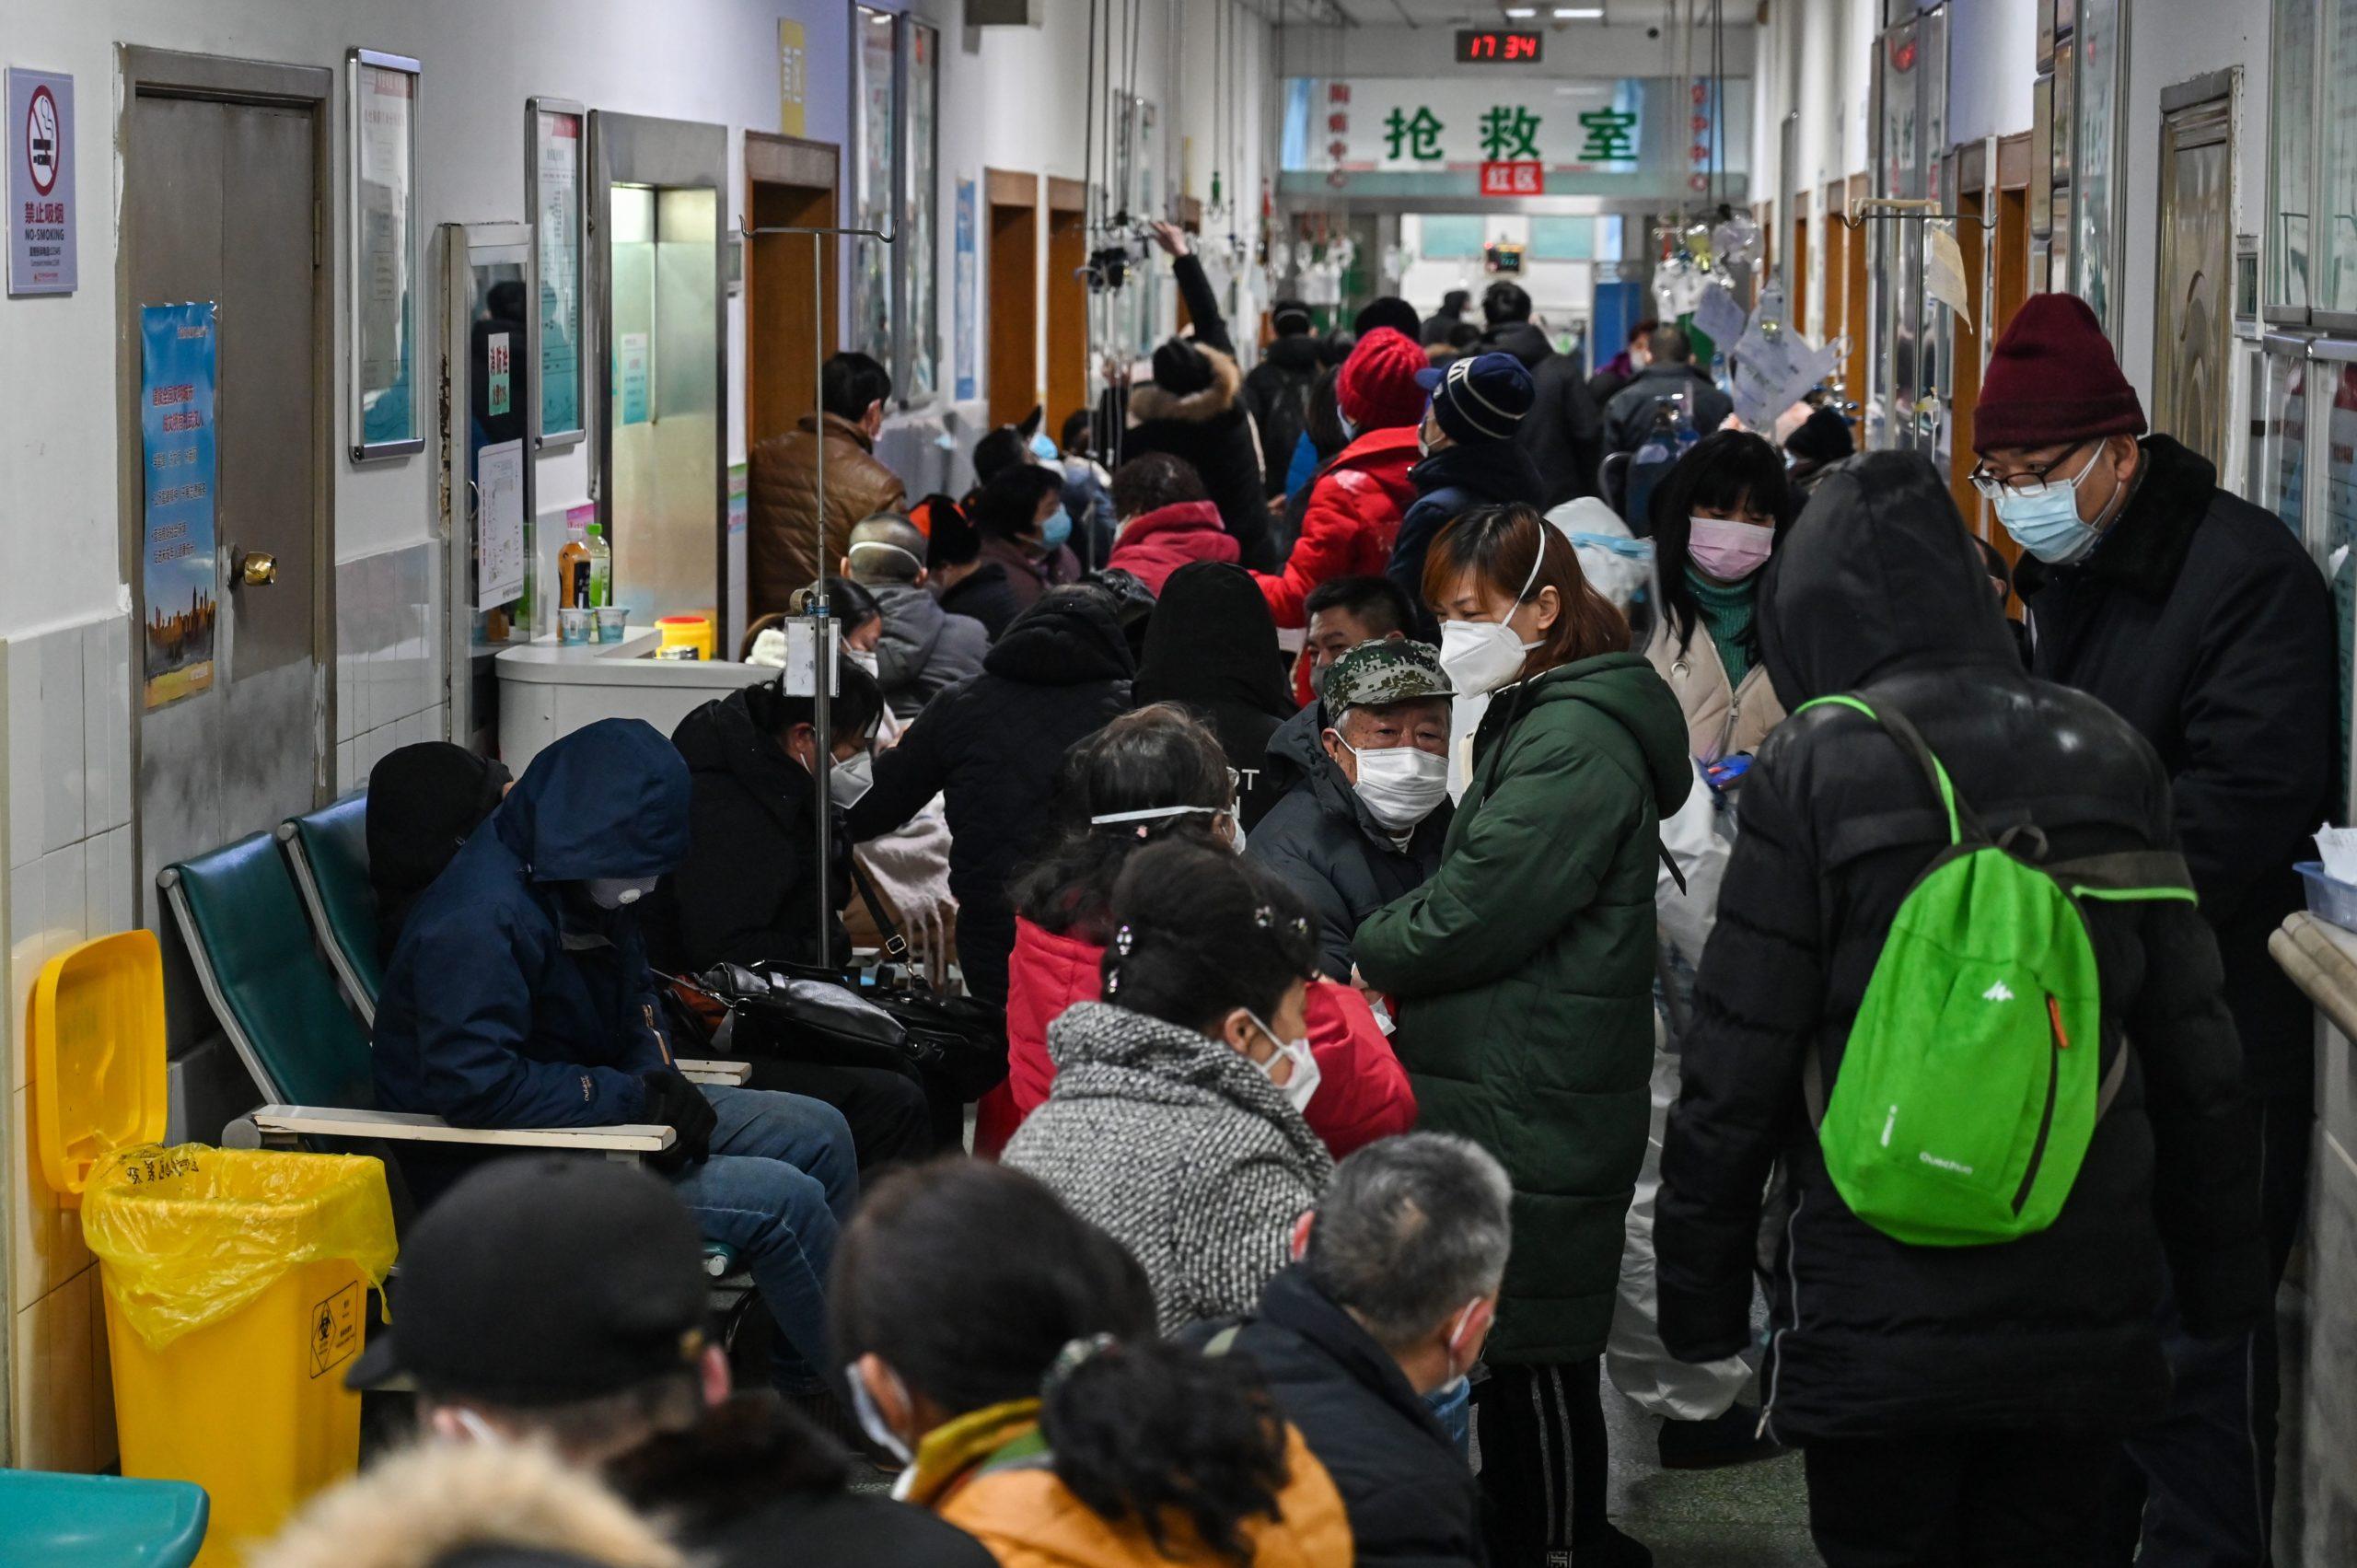 63 million People On Lock Down As Coronavirus Spreads Across 13 Countries